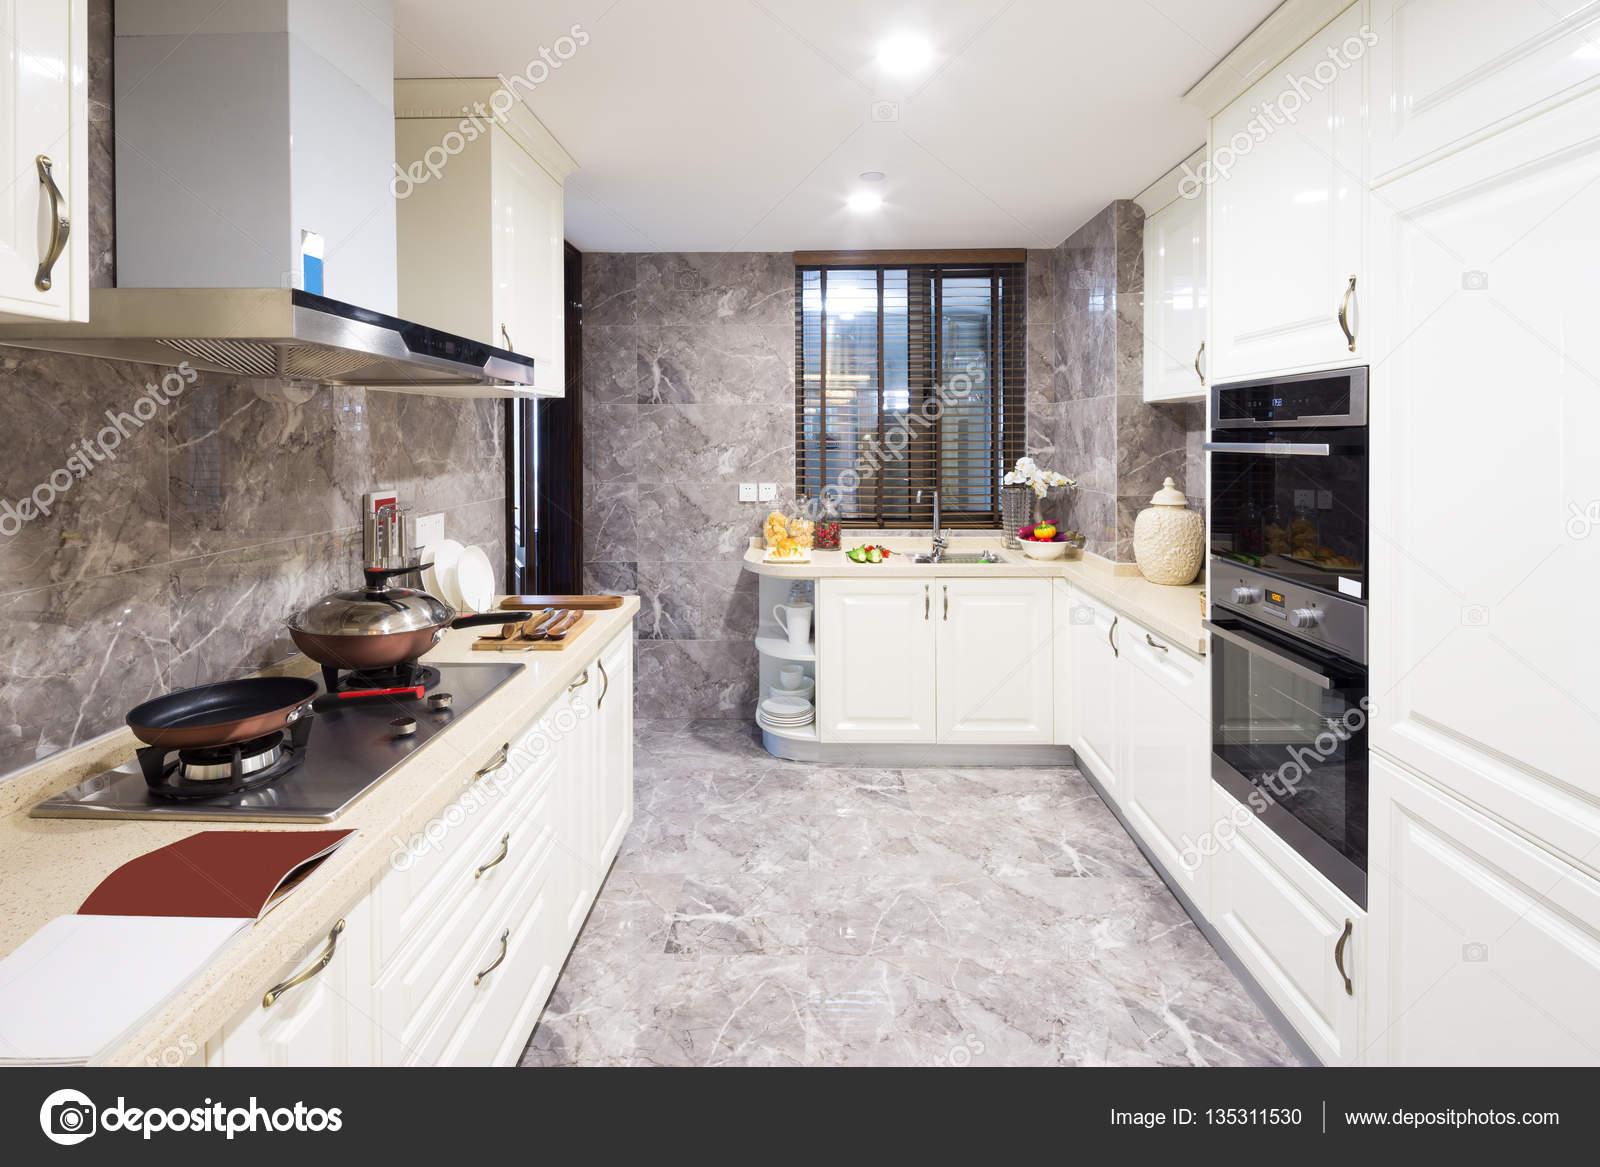 moderne küche interieur — Stockfoto © zhudifeng #135311530